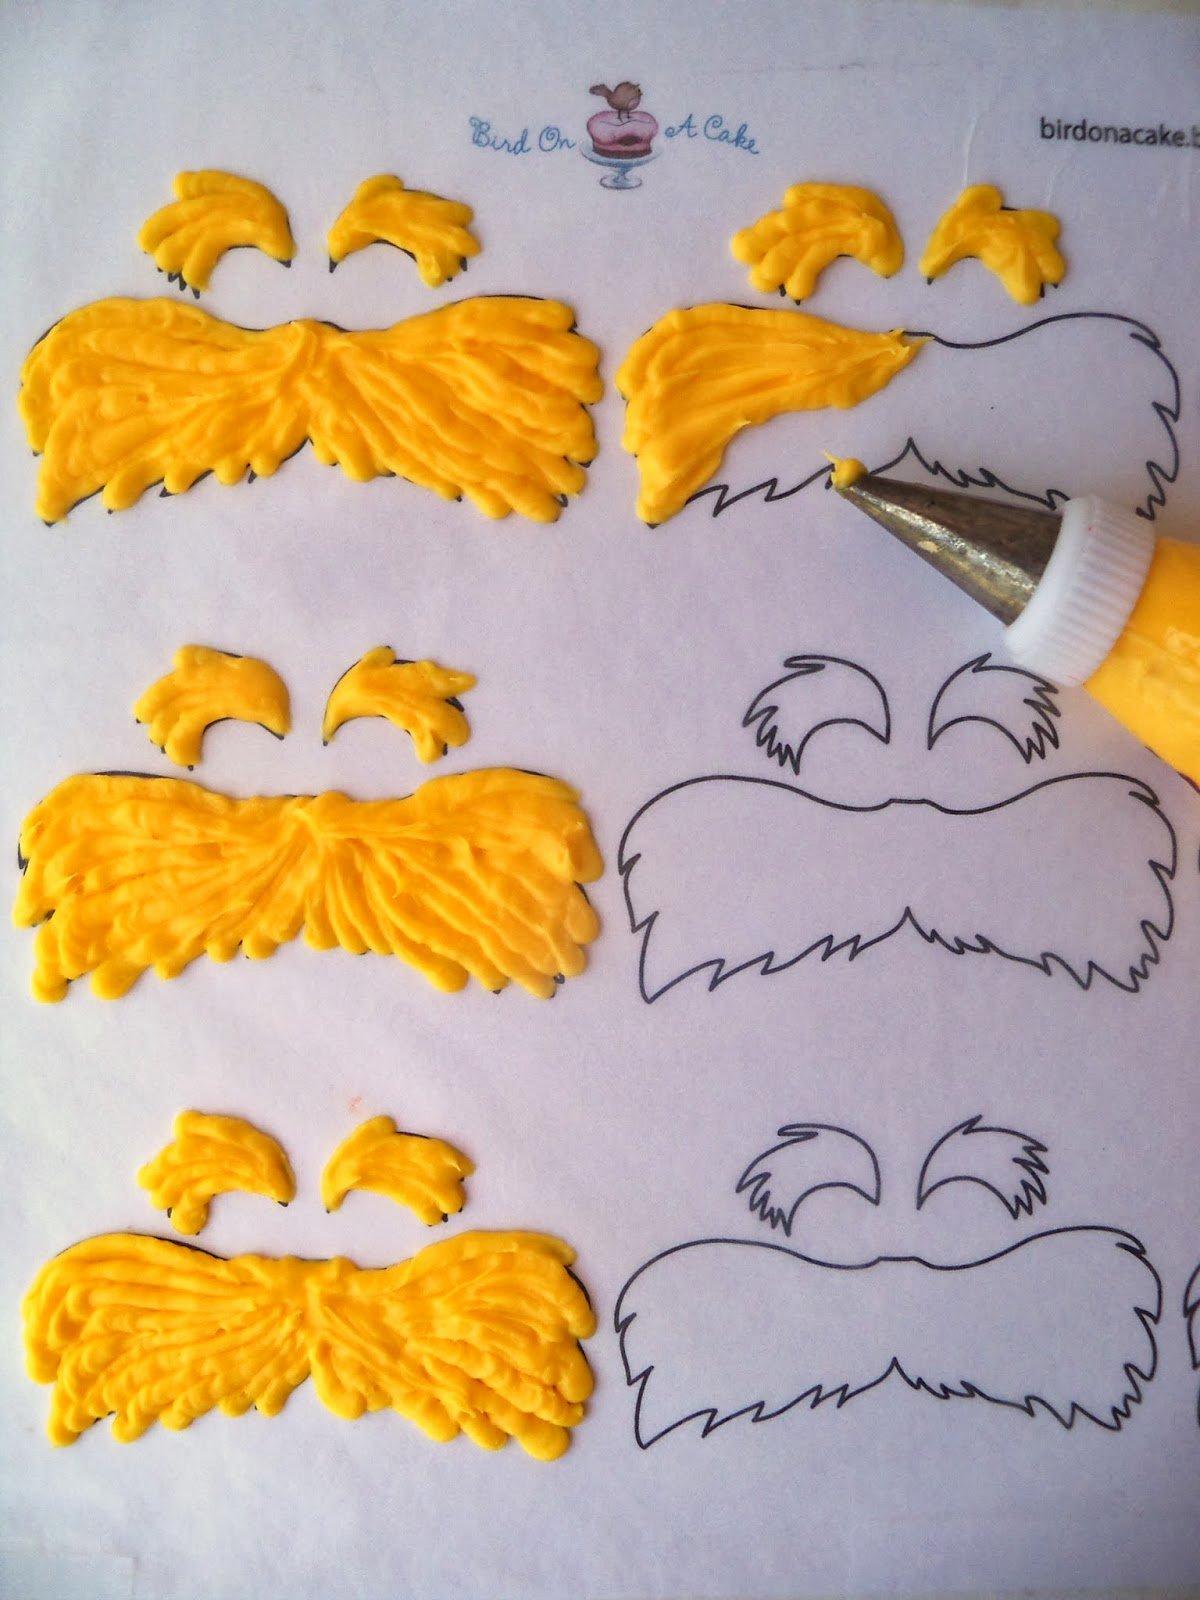 Printable Lorax Mustache and Eyebrows Beautiful Bird A Cake